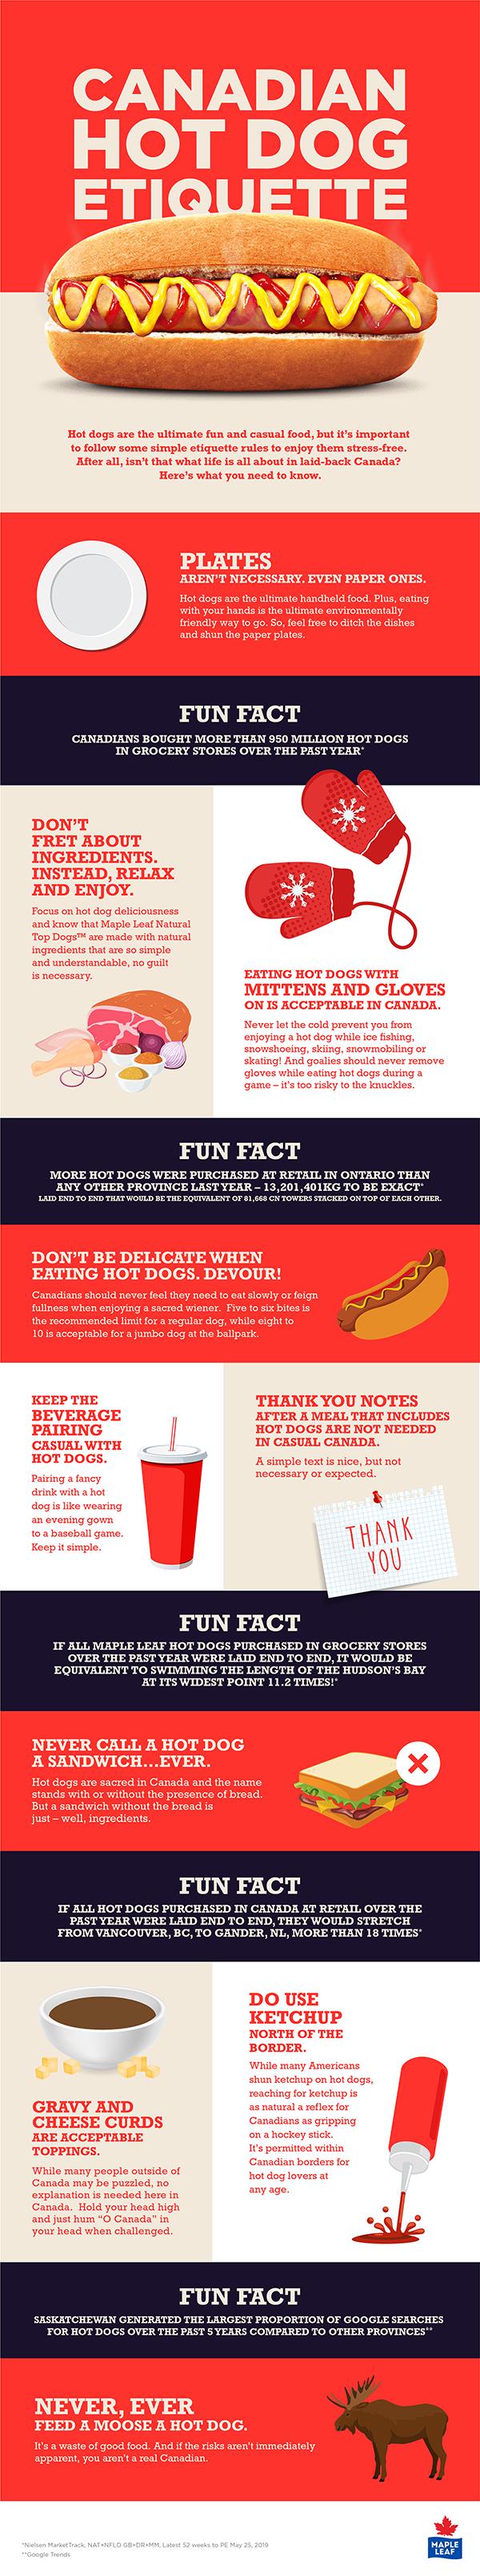 Canadian Hot Dog Etiquette